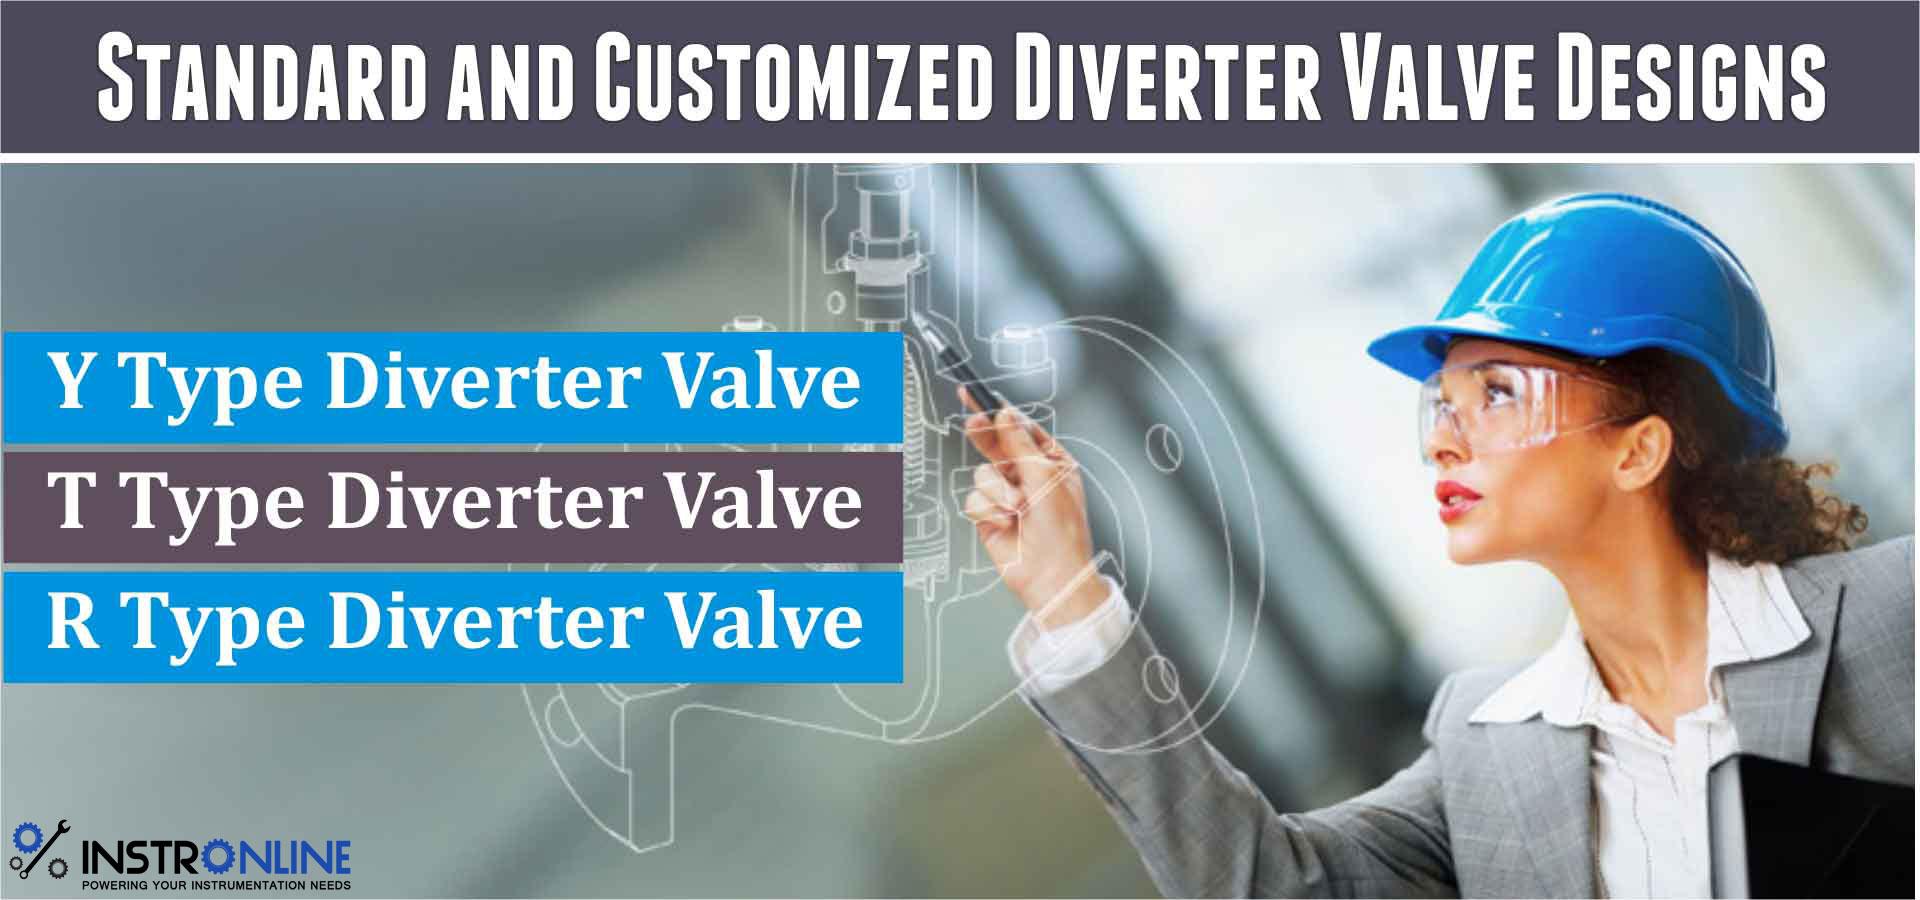 Automatic Diverter Valve